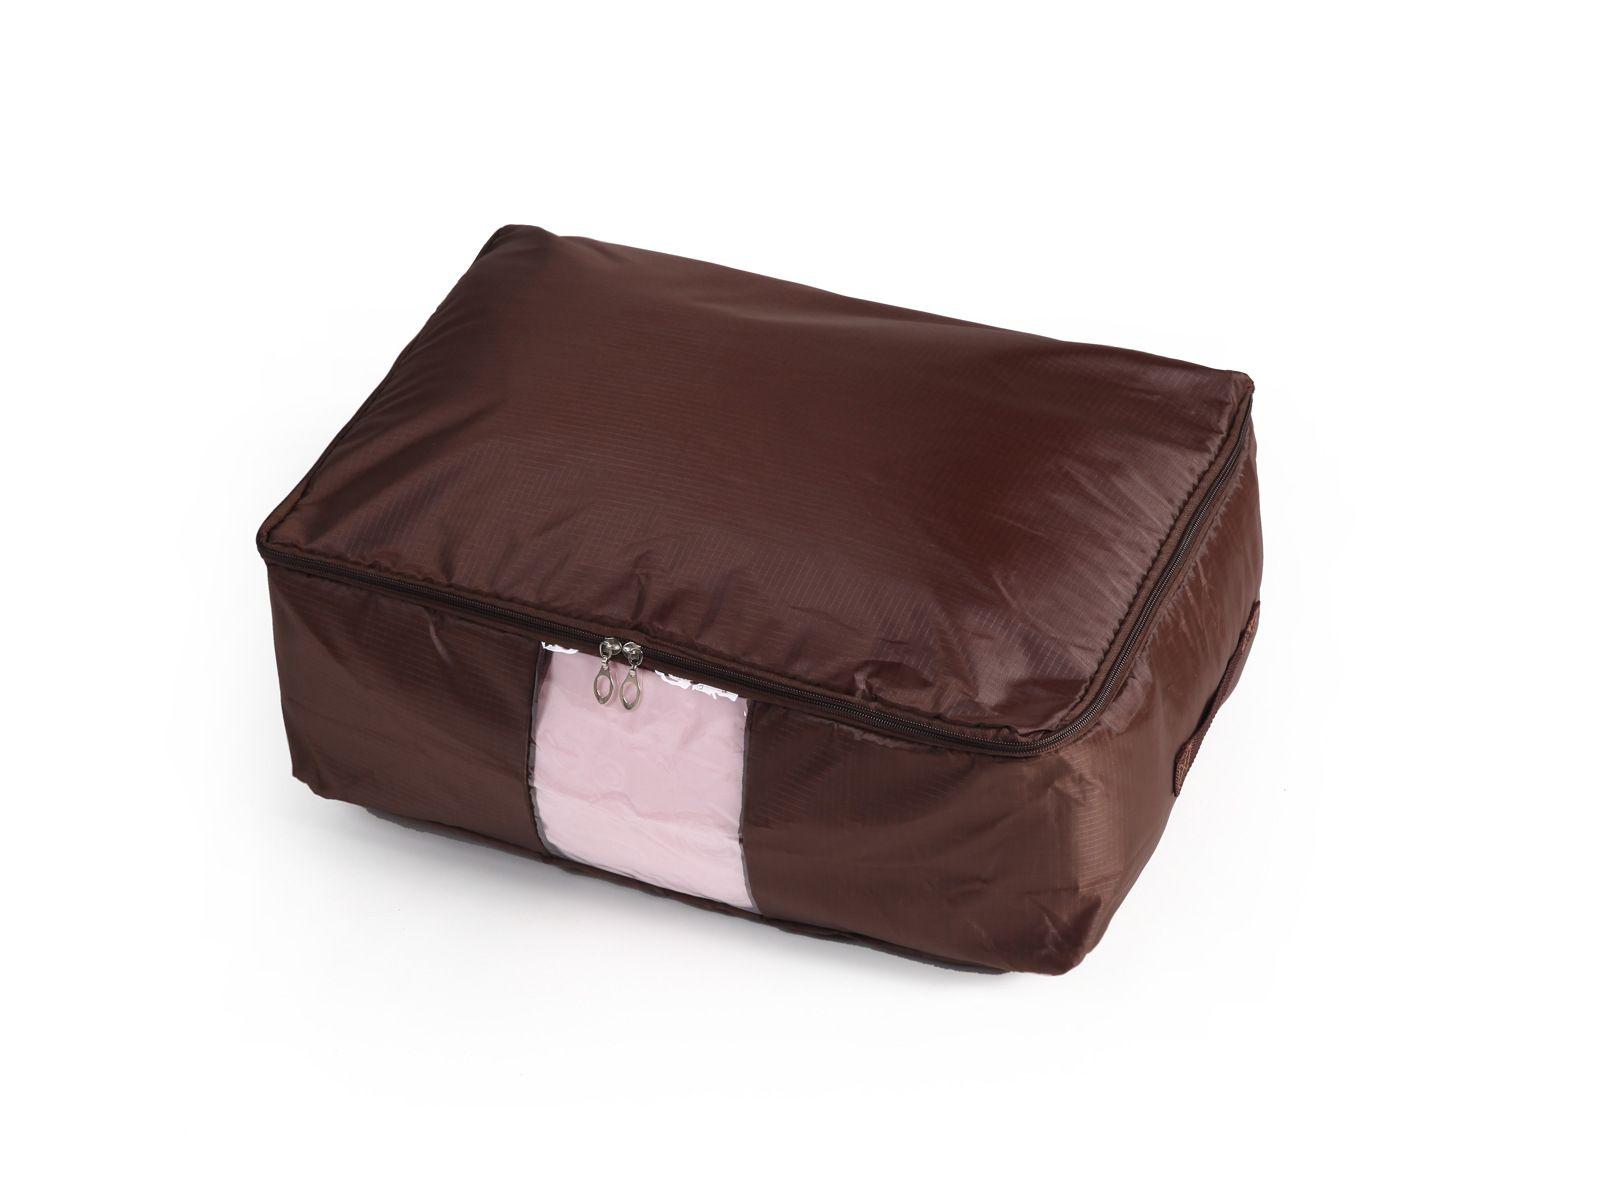 2018 Oxford Cloth Cotton Quilt Cover Storage Bag Clothing Storage ... : quilt storage bags - Adamdwight.com